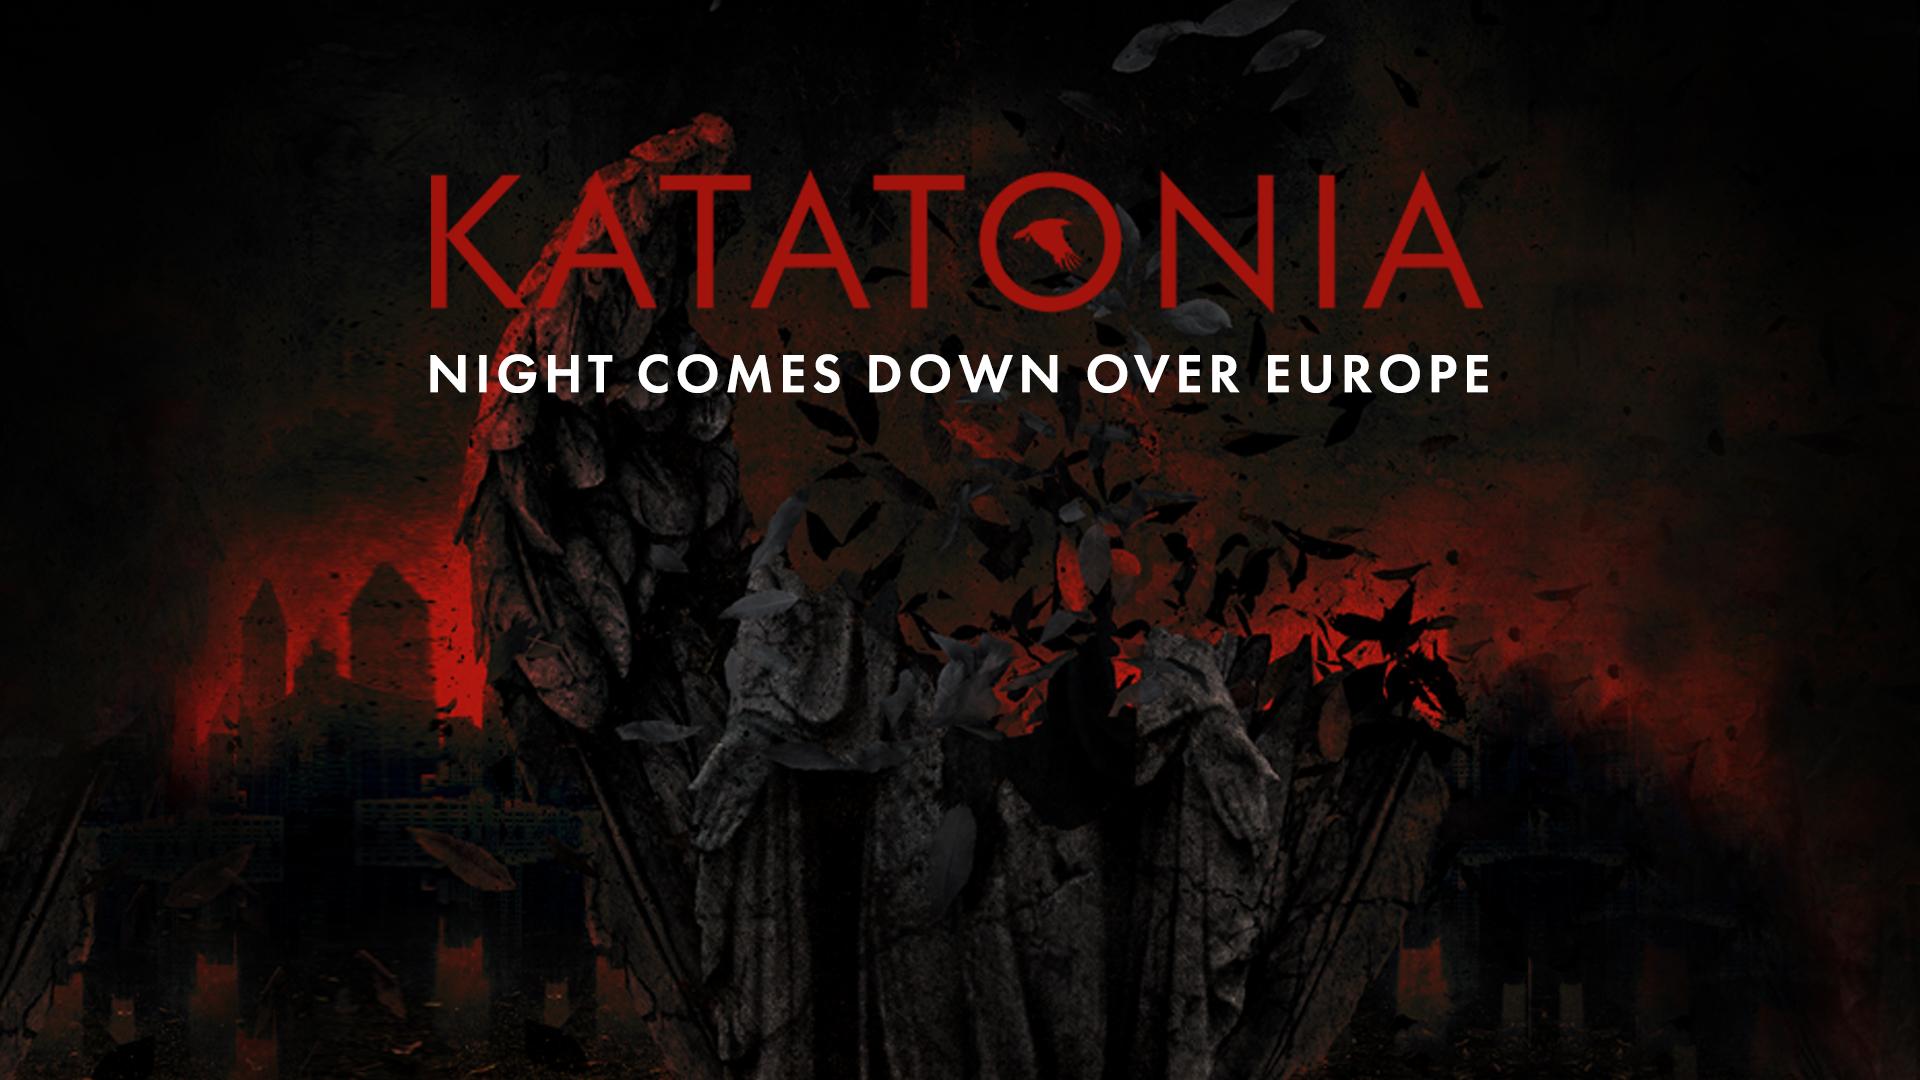 KATATONIA ζωντανά στην Αθήνα τον Φεβρουάριο!